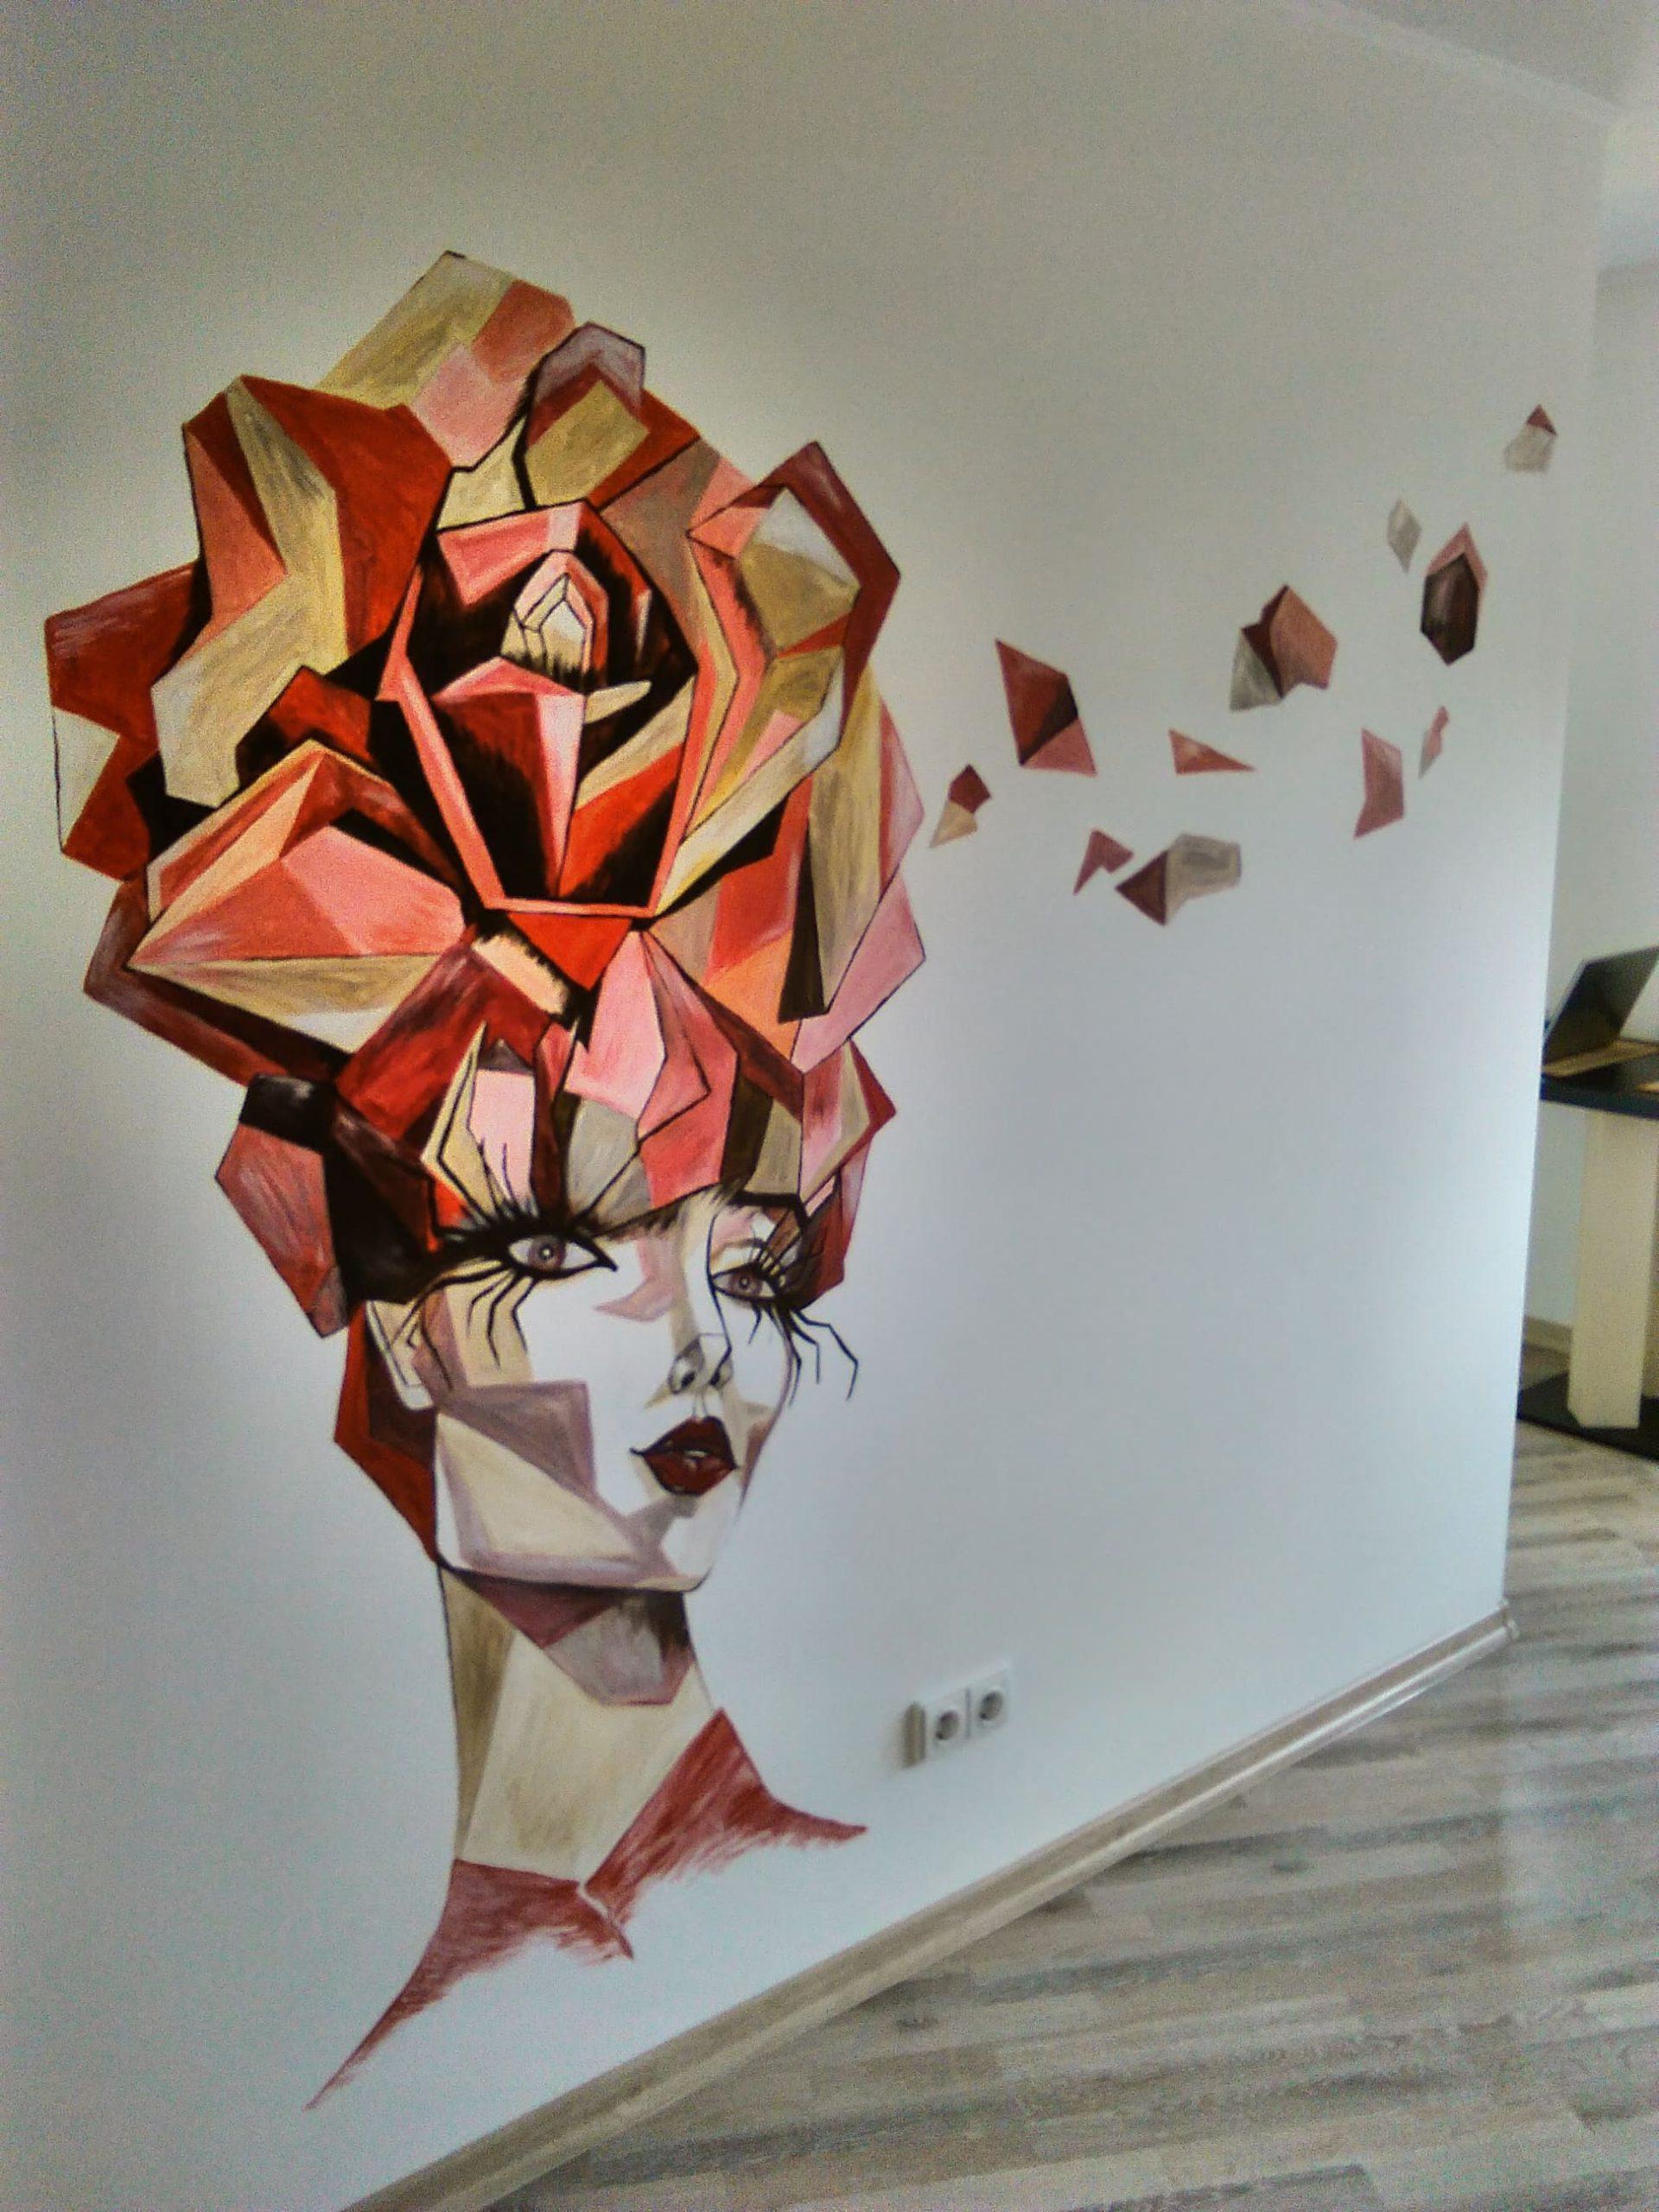 menine-kuryba-sienu-dekoravimas-ivairus-interjerai (5)